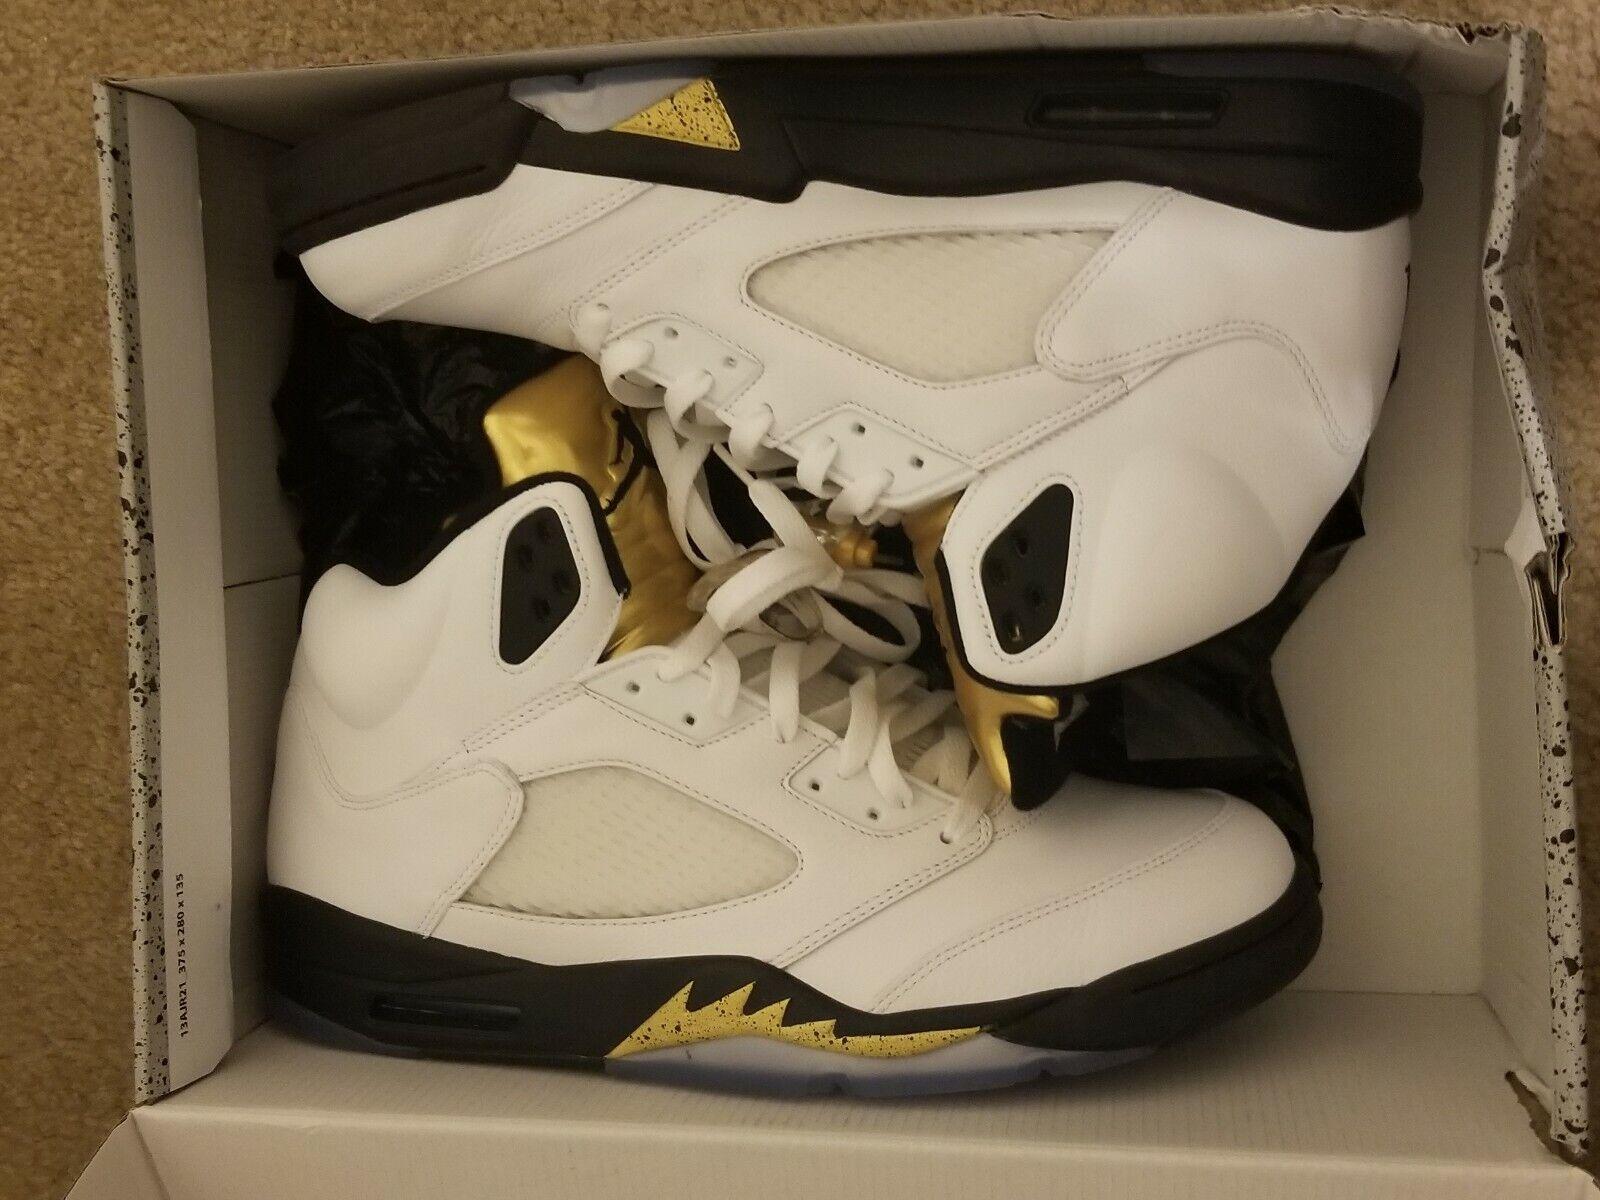 Retro Oro Olímpico 5 Air Jordan Zapatillas Ntkelu28 Deportivas QdsrCth